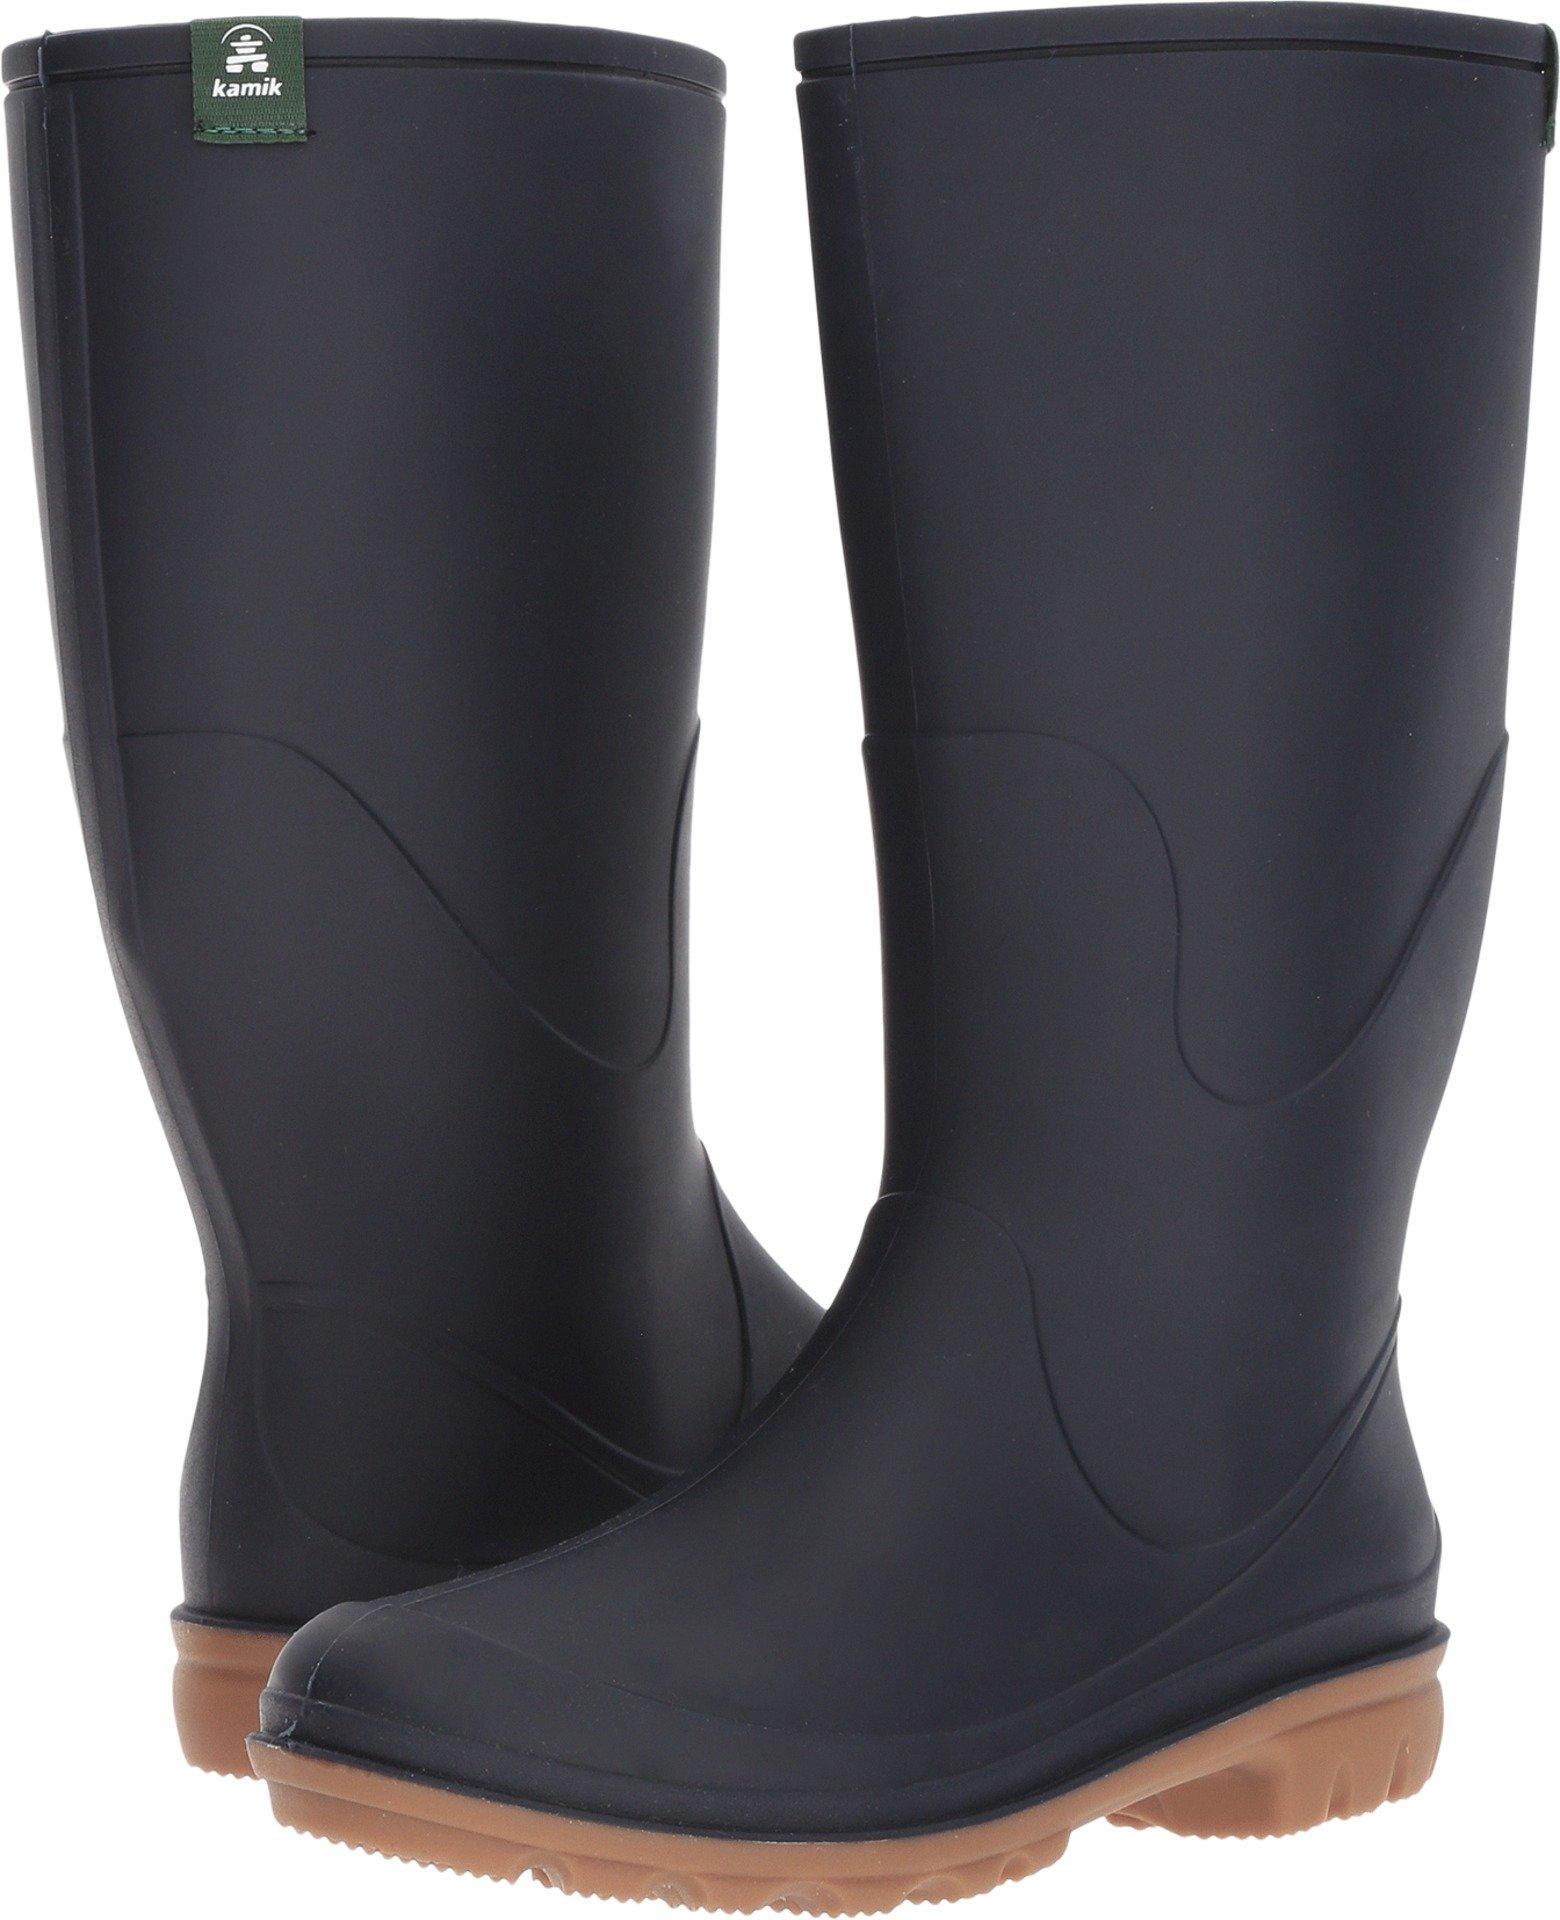 Kamik Women's Miranda Rain Boot, Navy, 7 D US by Kamik (Image #1)